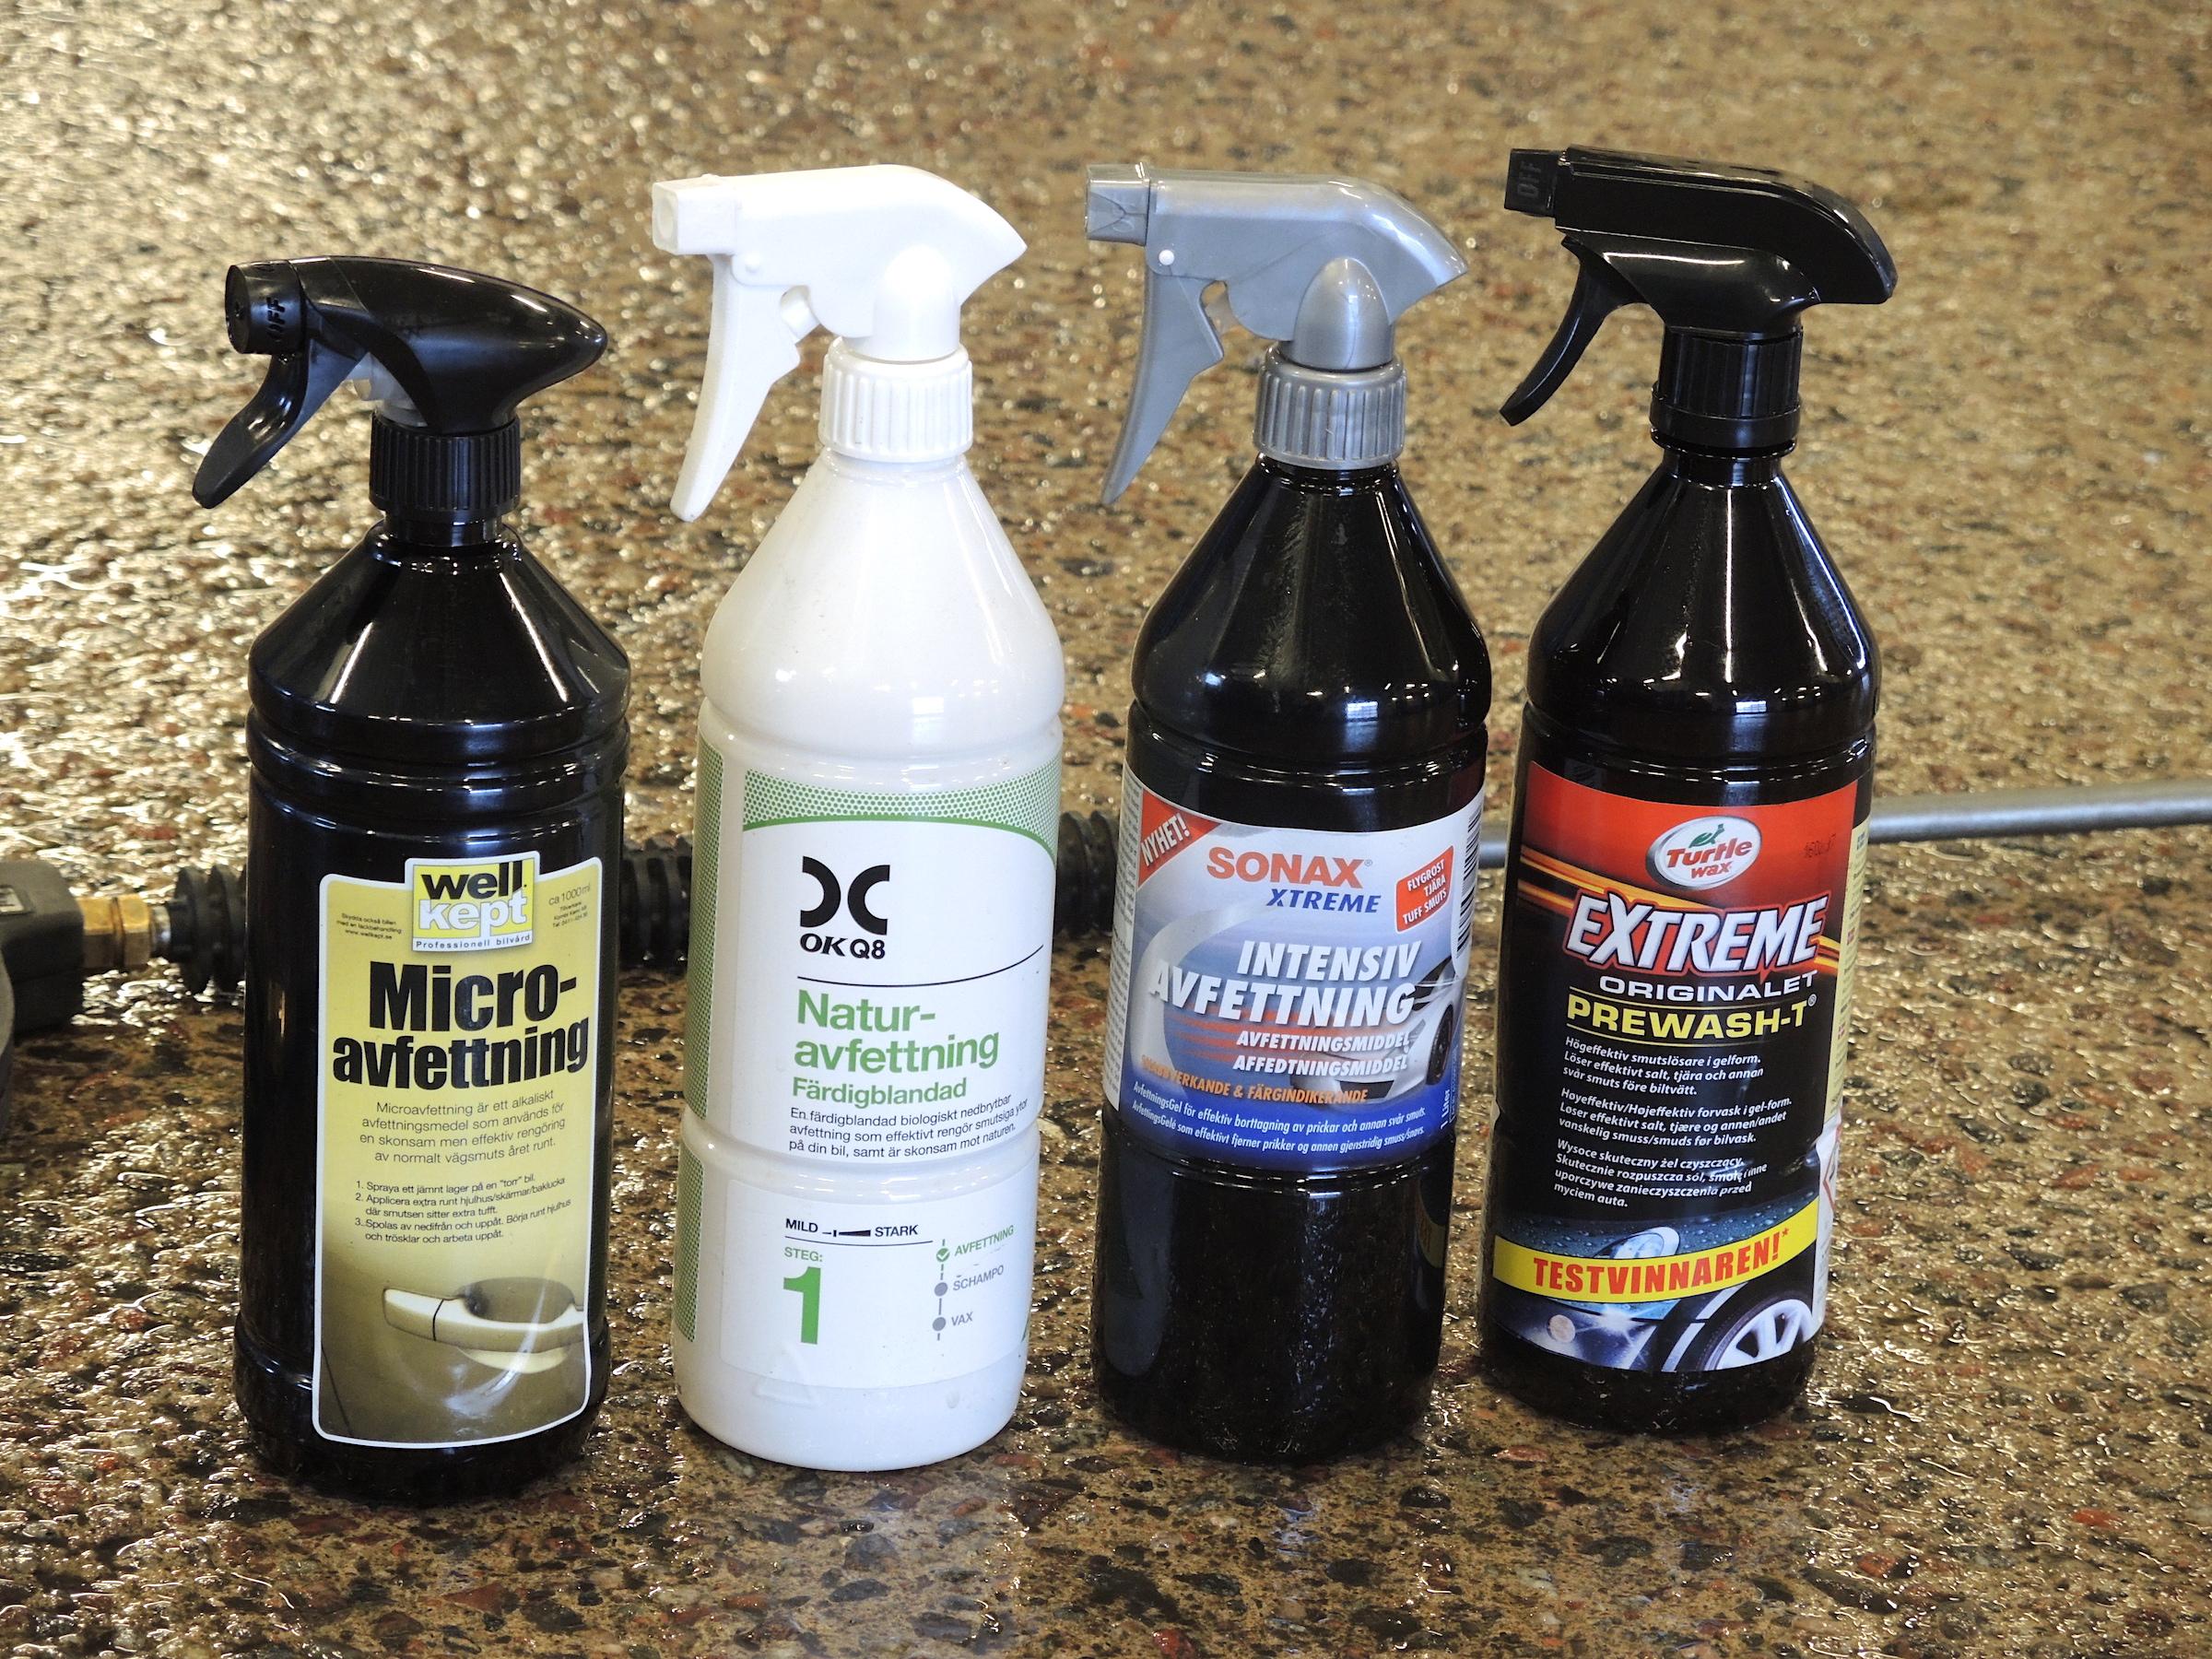 bra avfettningsmedel till bilen